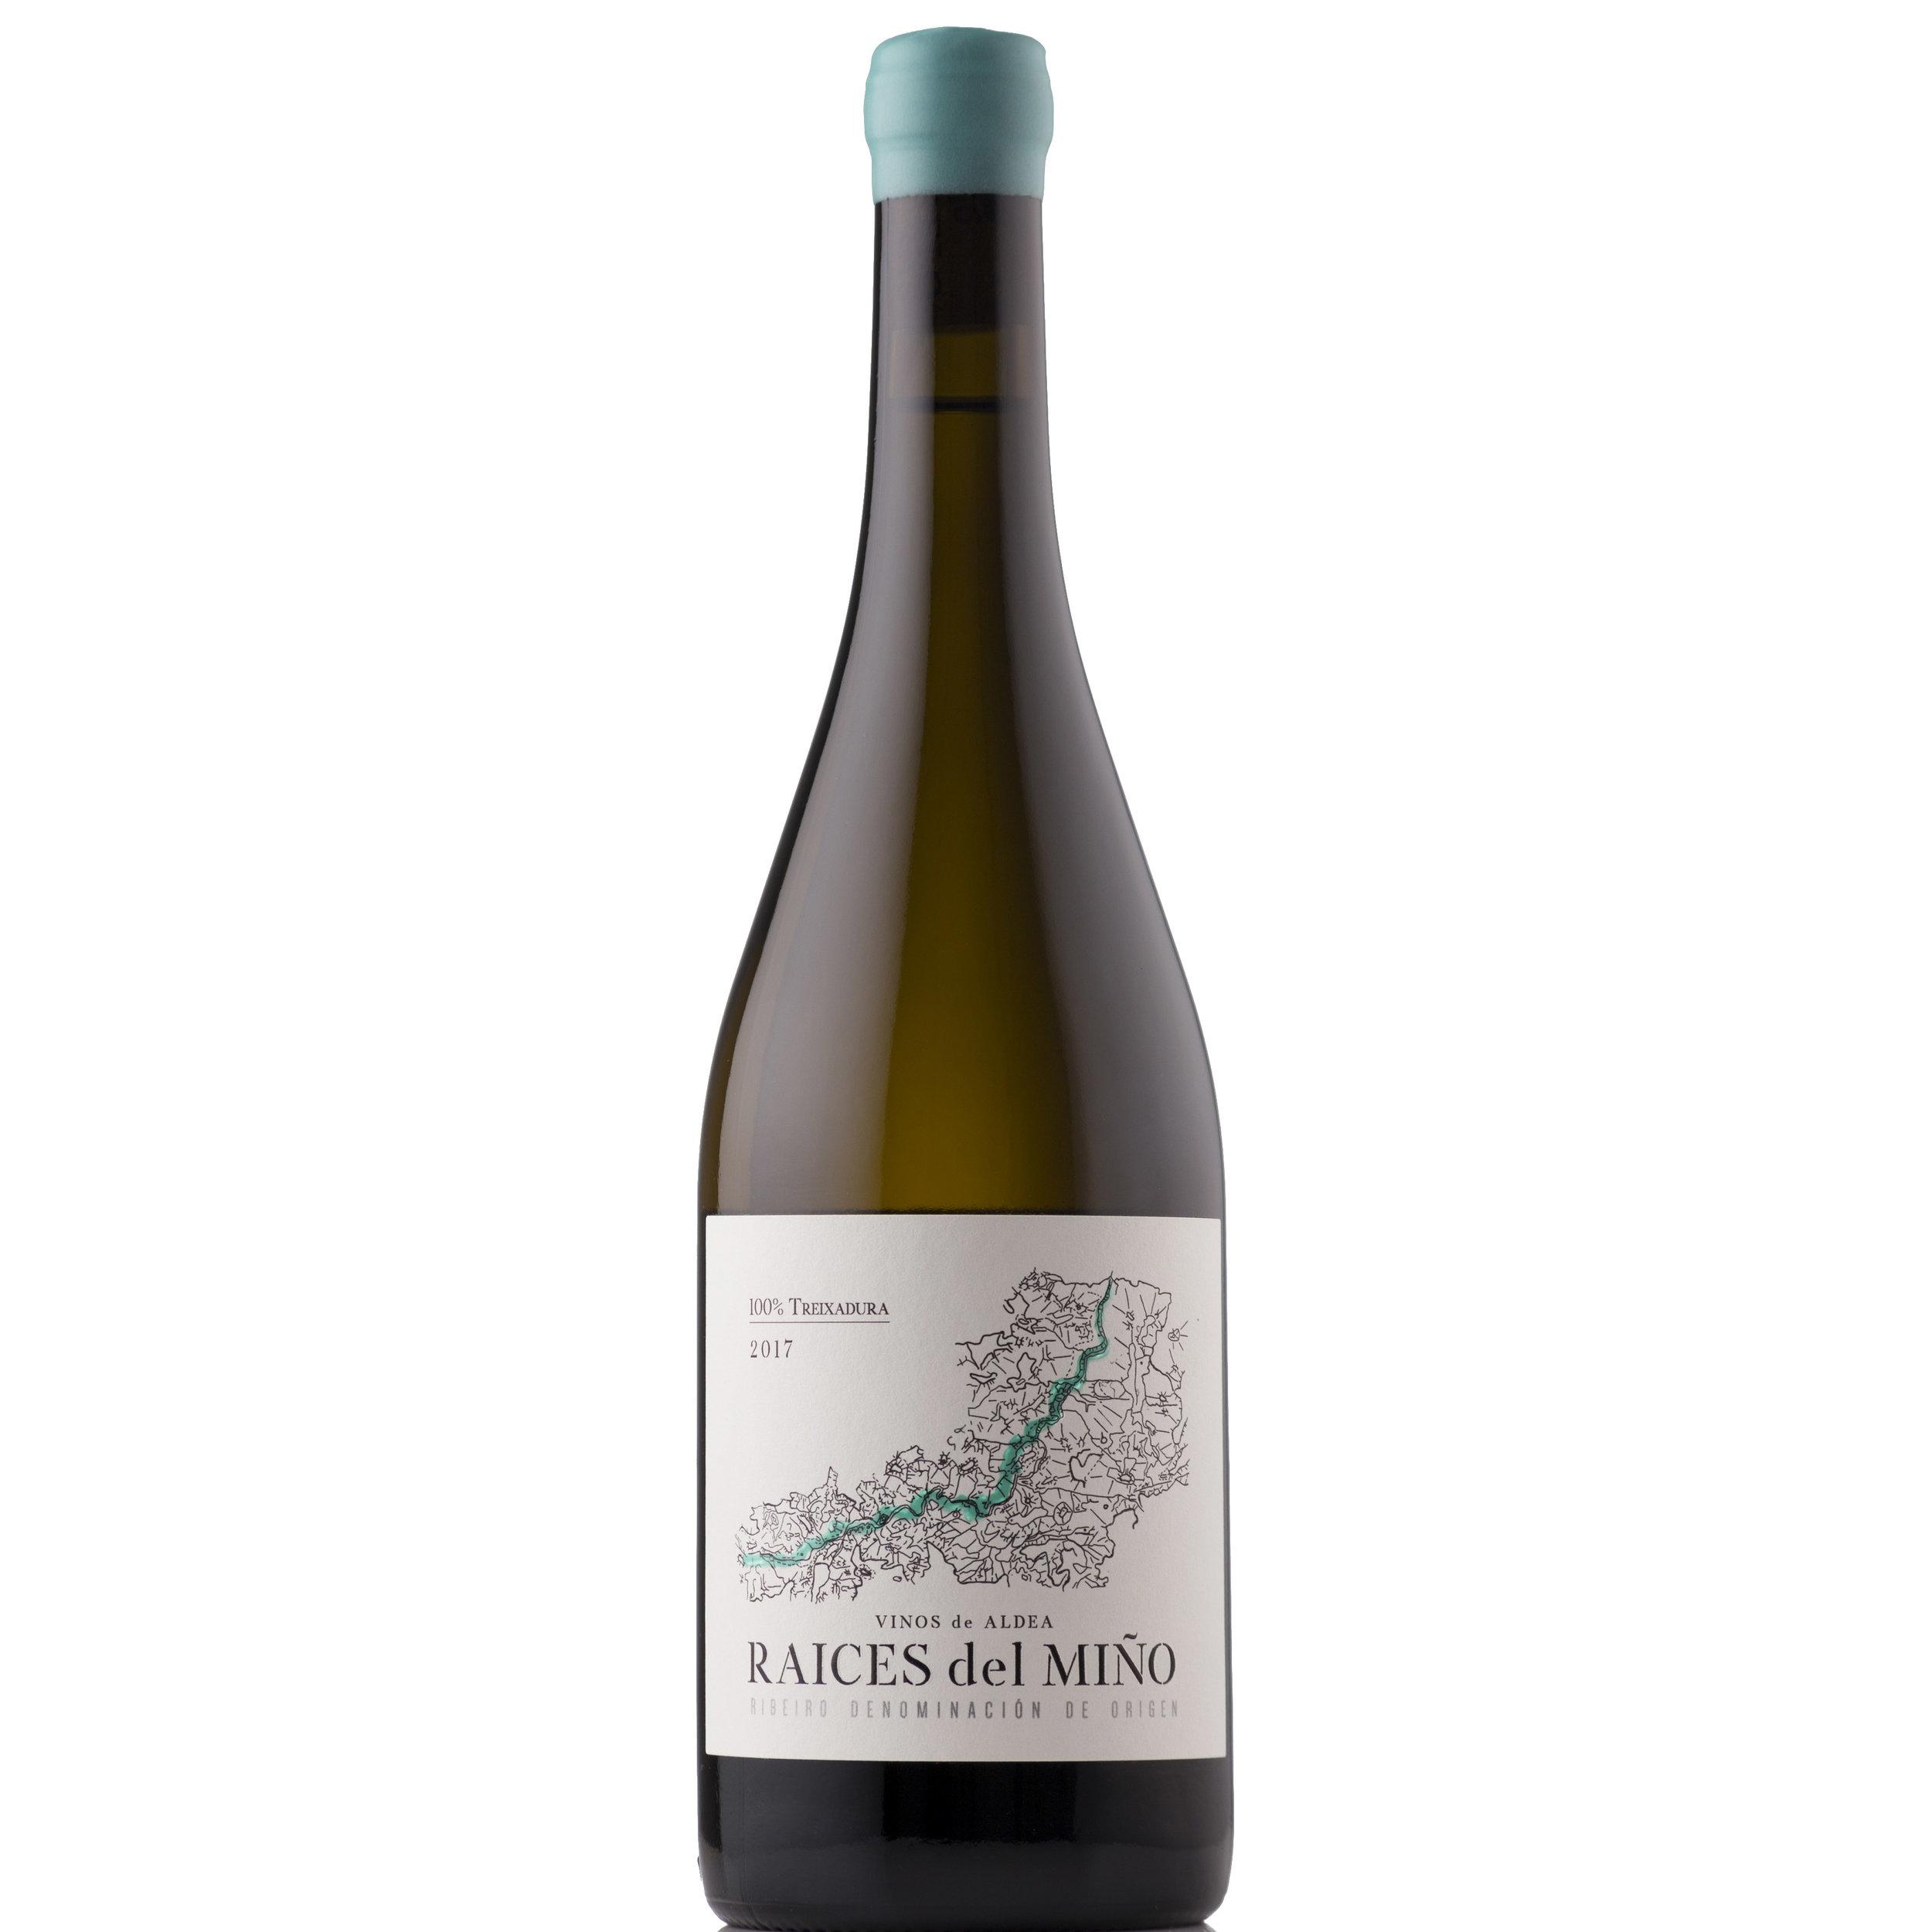 Raíces del Miño Treixadura 2017 – D.O. Ribeiro - La cepa blanca emblemática del RibeiroPartida: 3860 botellas (1512 disponibles en Argentina).Precio: $1500